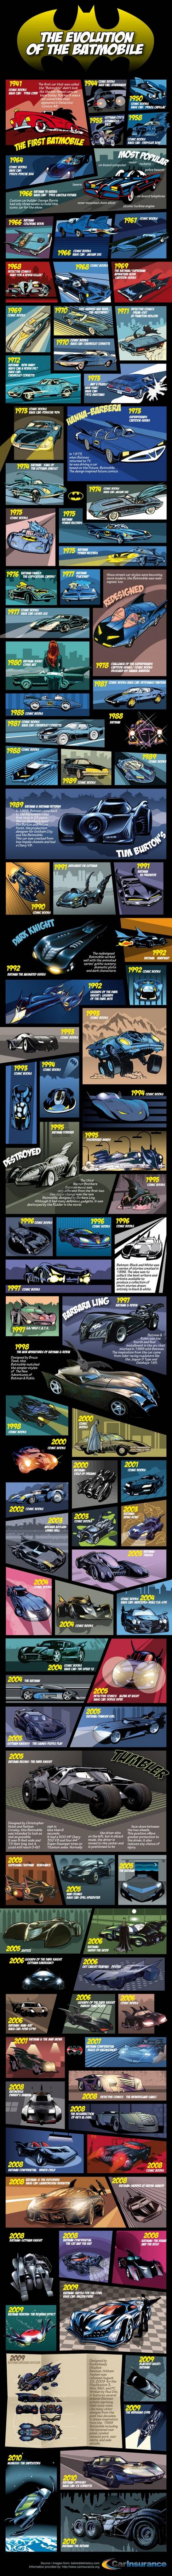 Batmobile page 560x8375